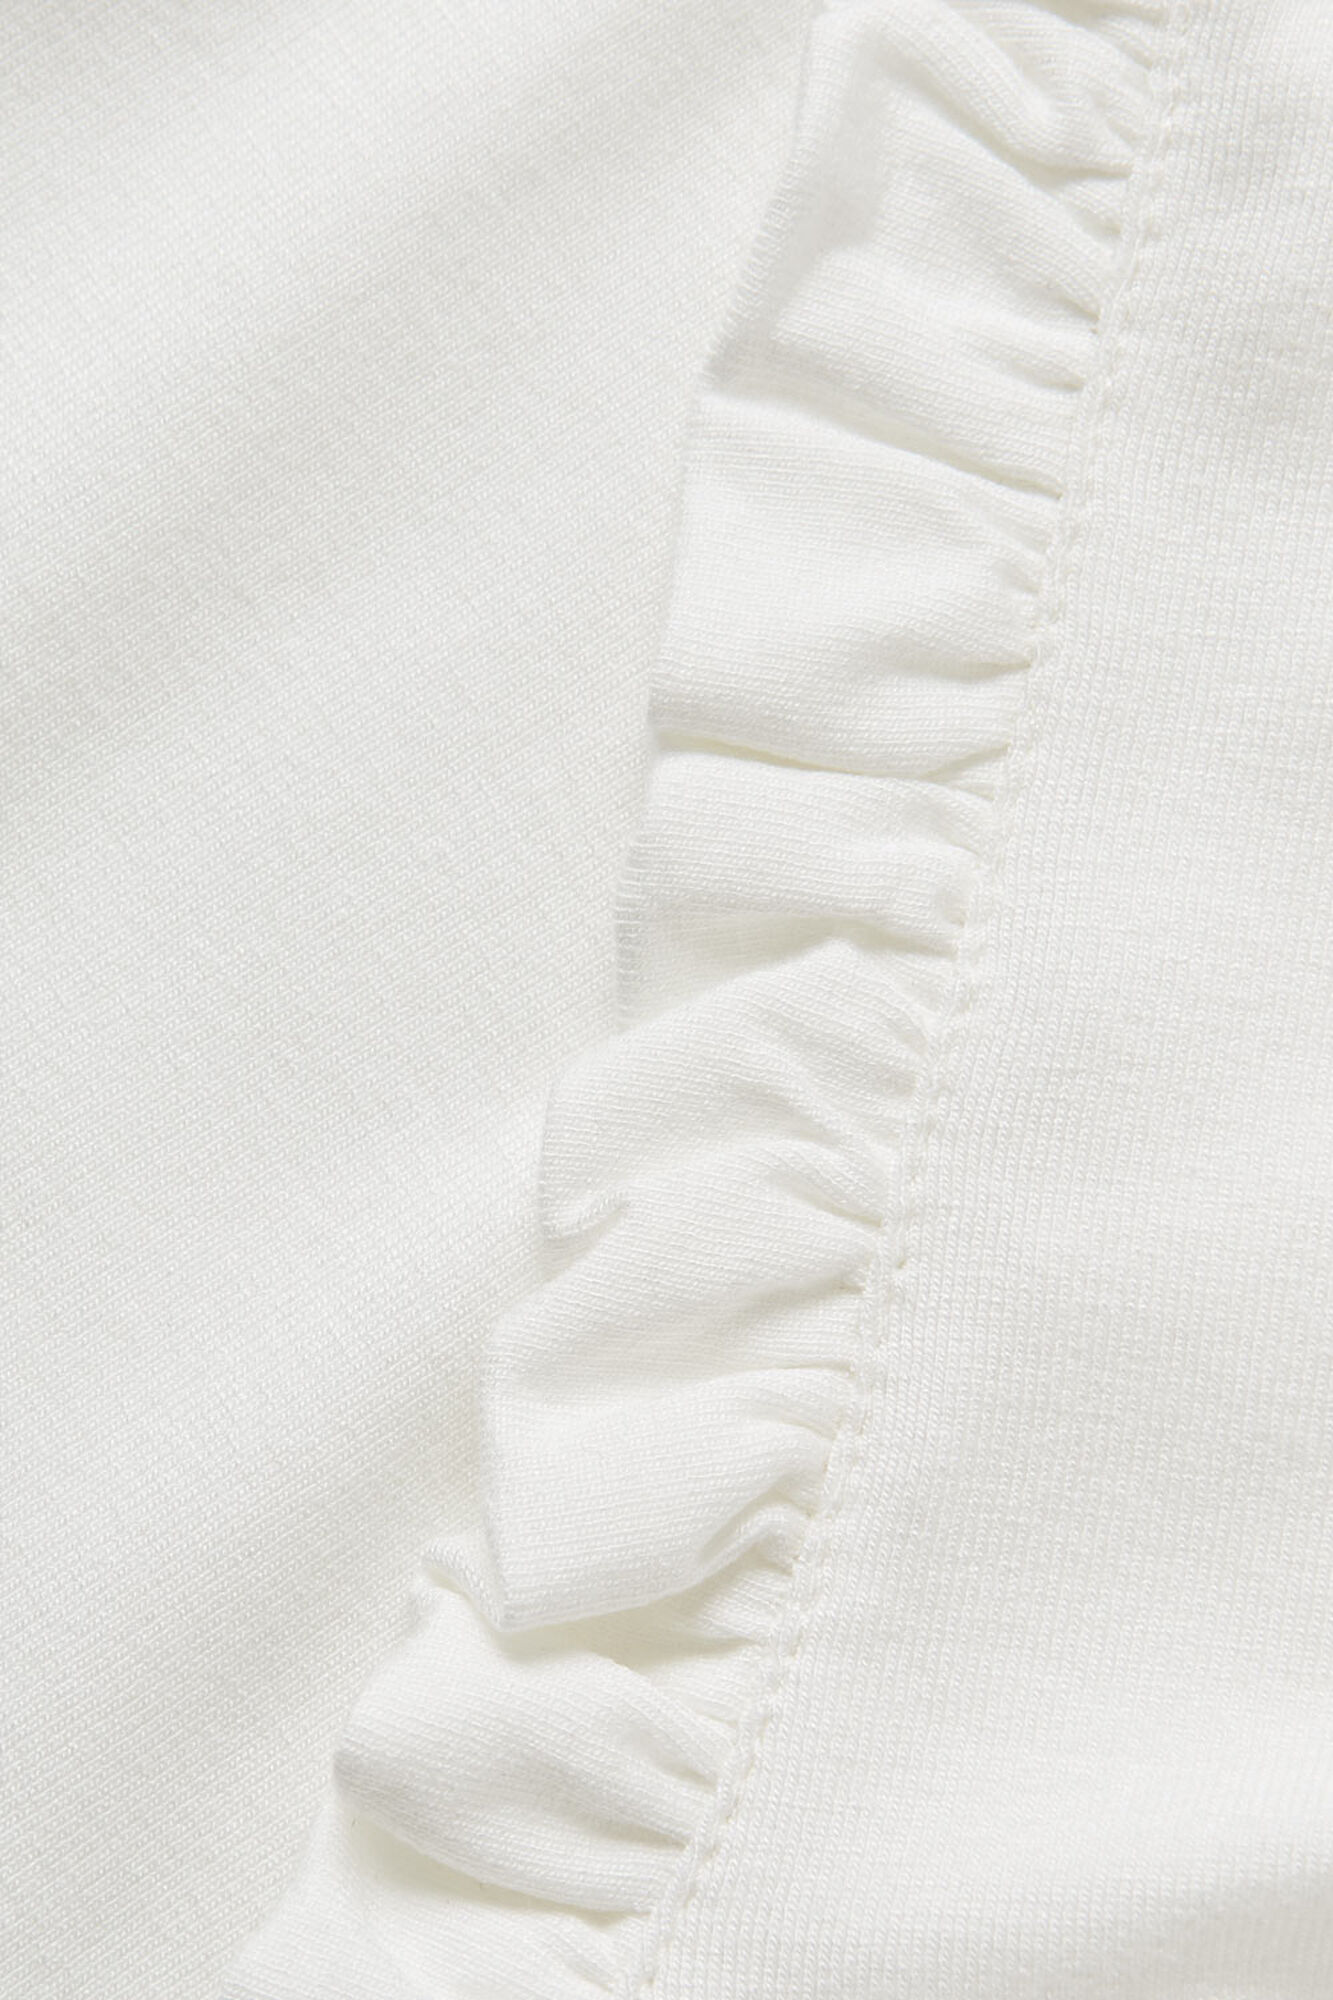 EDWINA TOP, Cream, hi-res